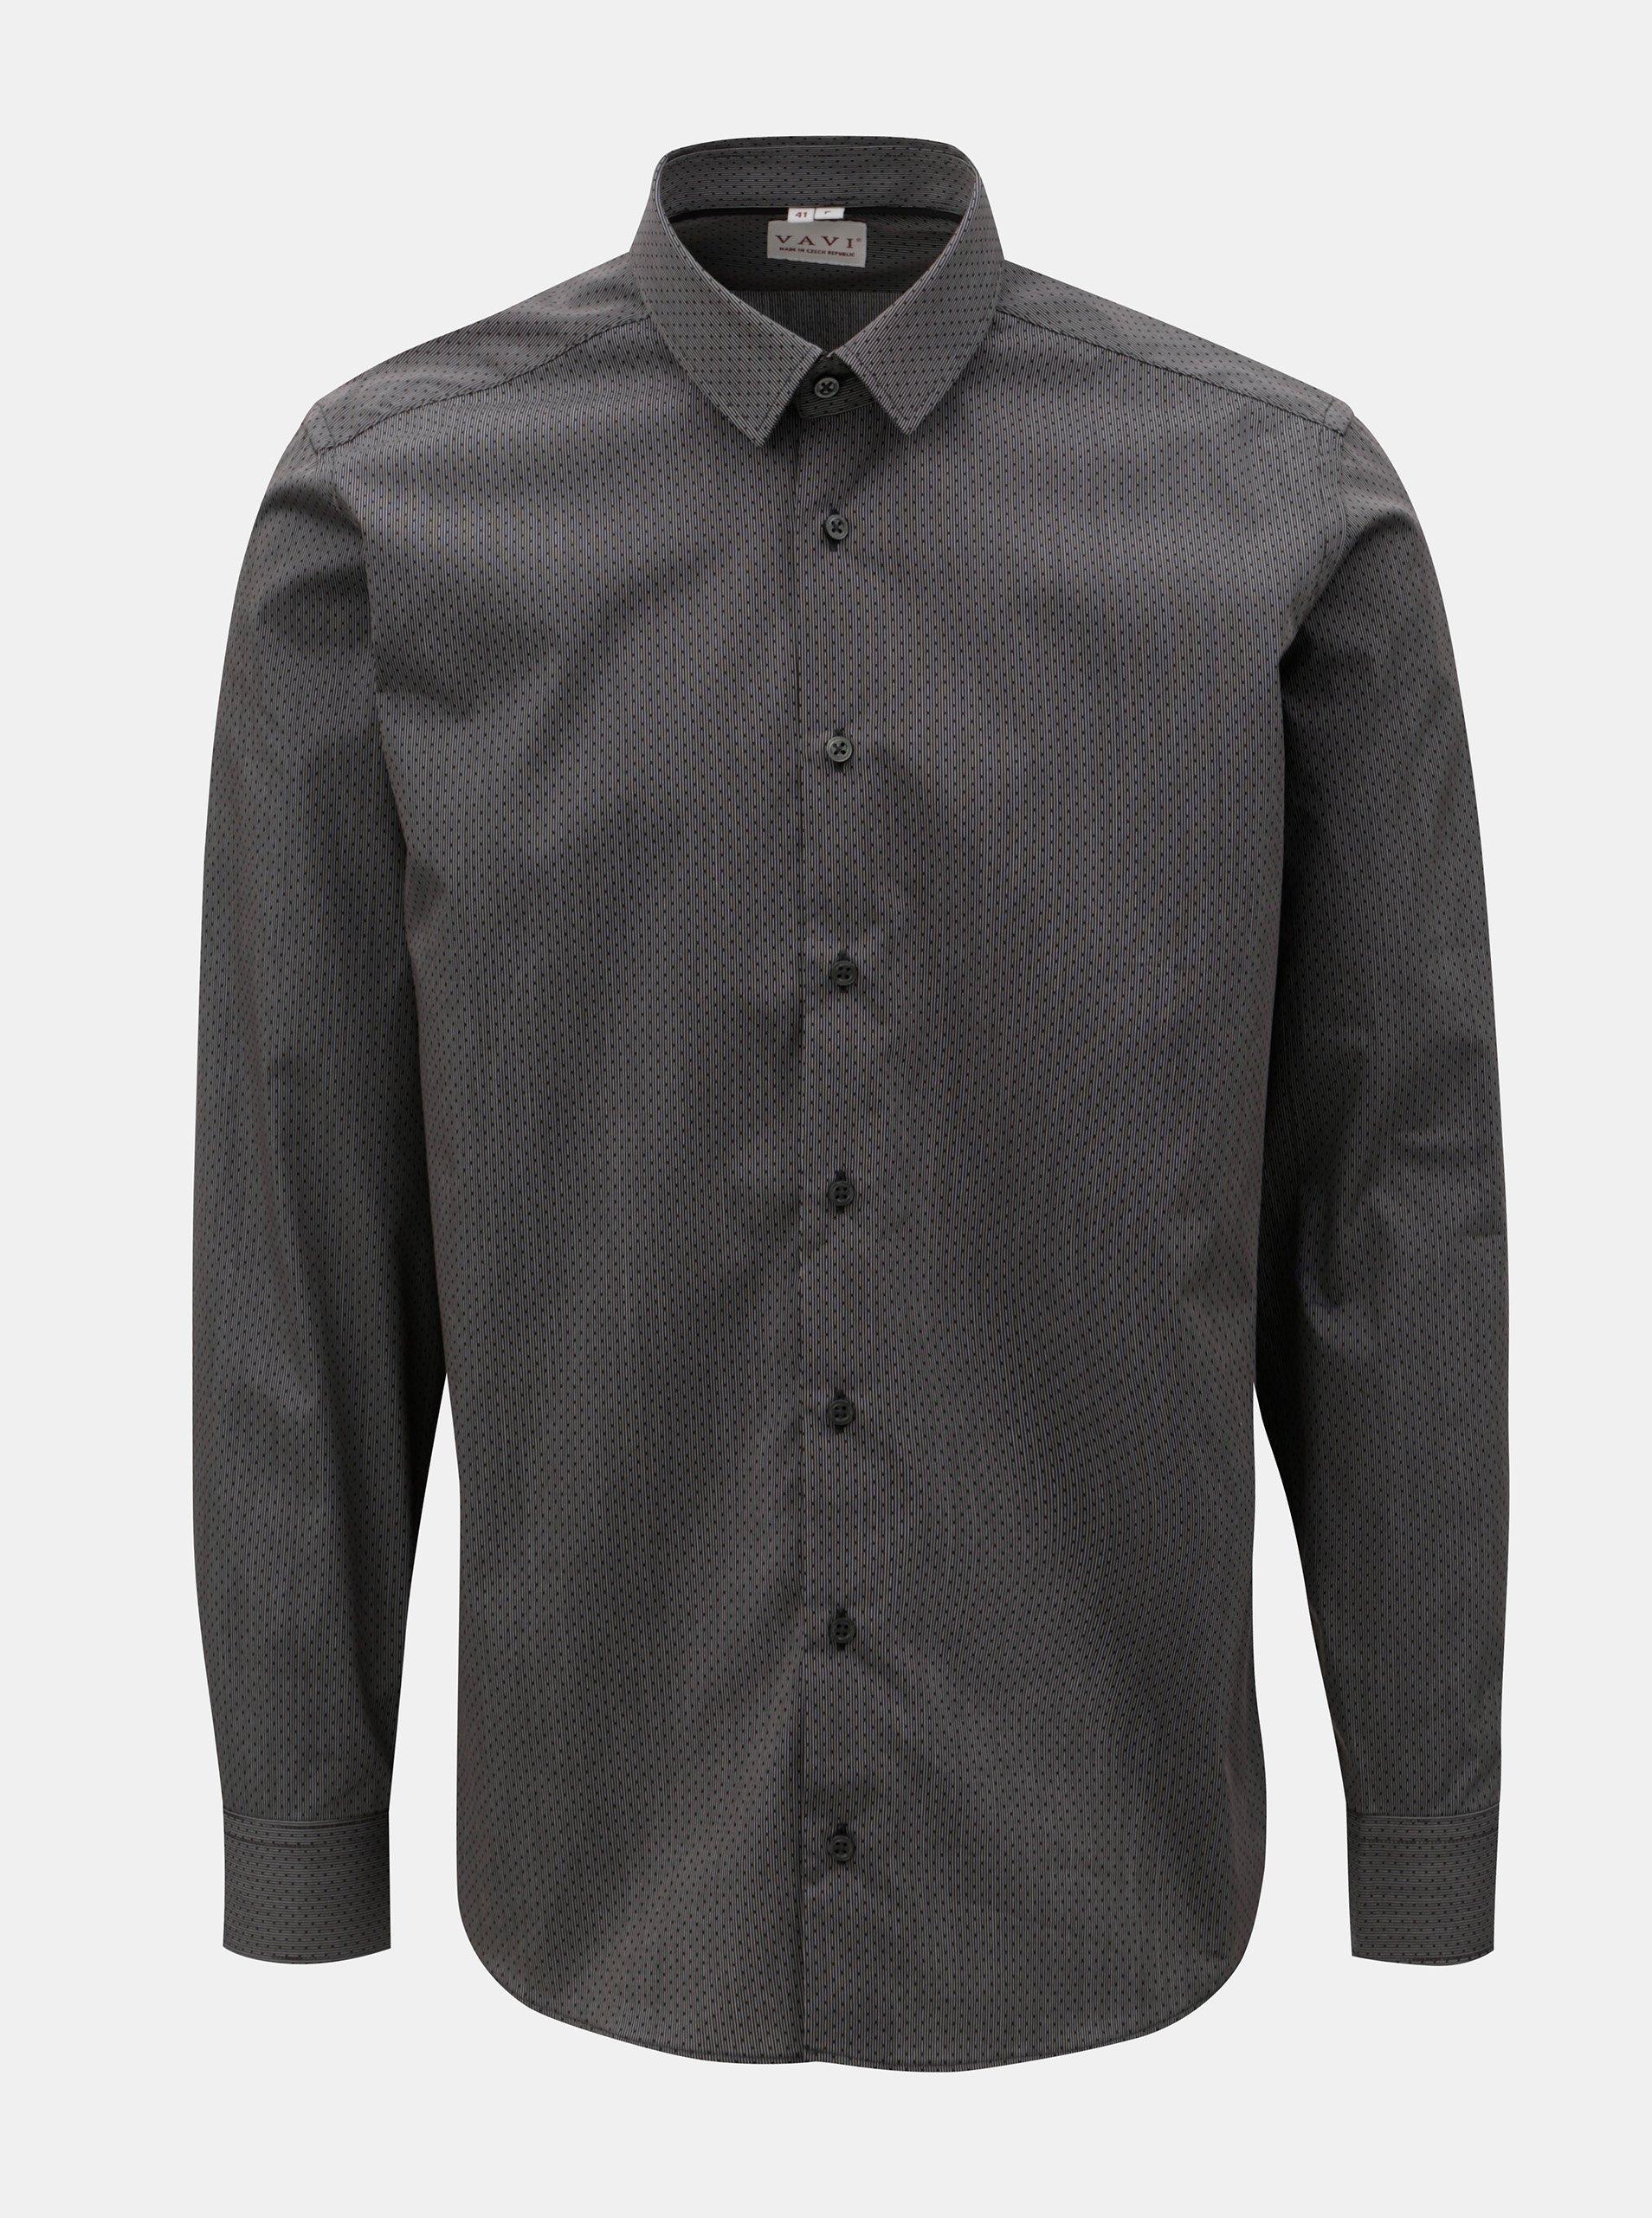 Fotografie Tmavě šedá pánská košile s drobným vzorem a dlouhým rukávem VAVI